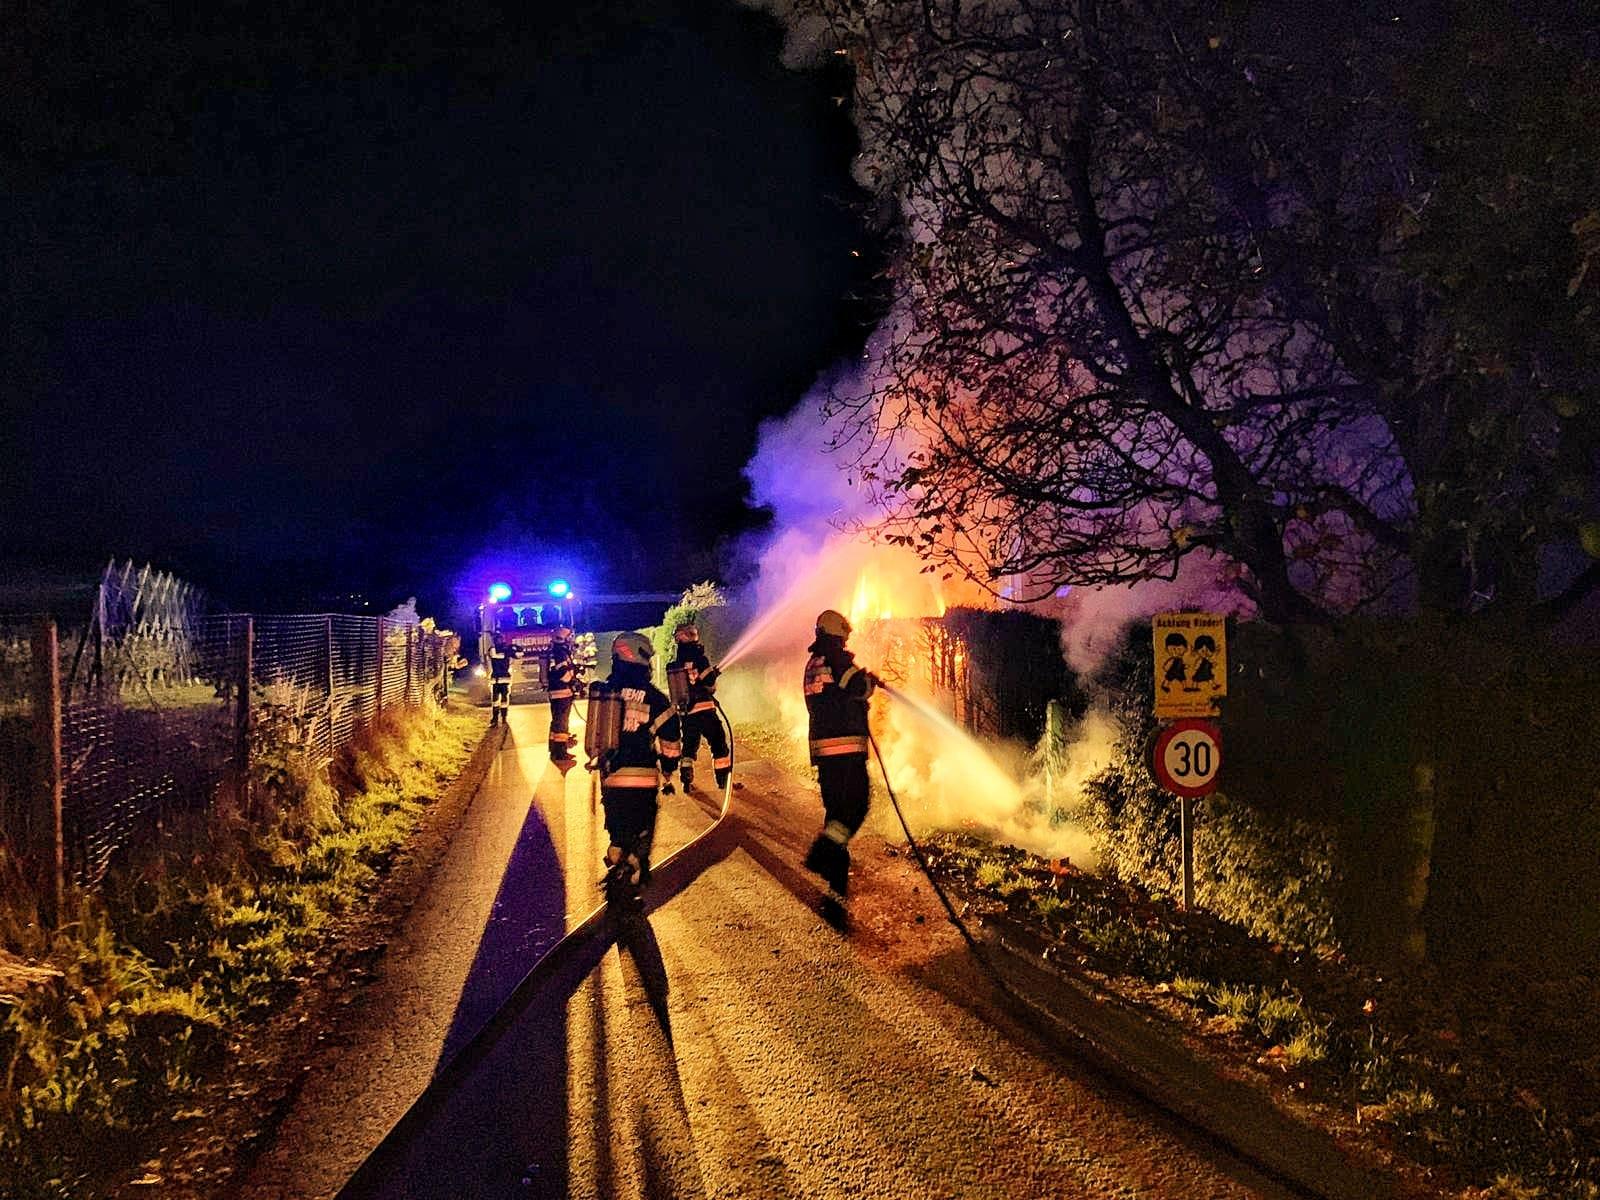 Heckenbrand am 27.10.2019